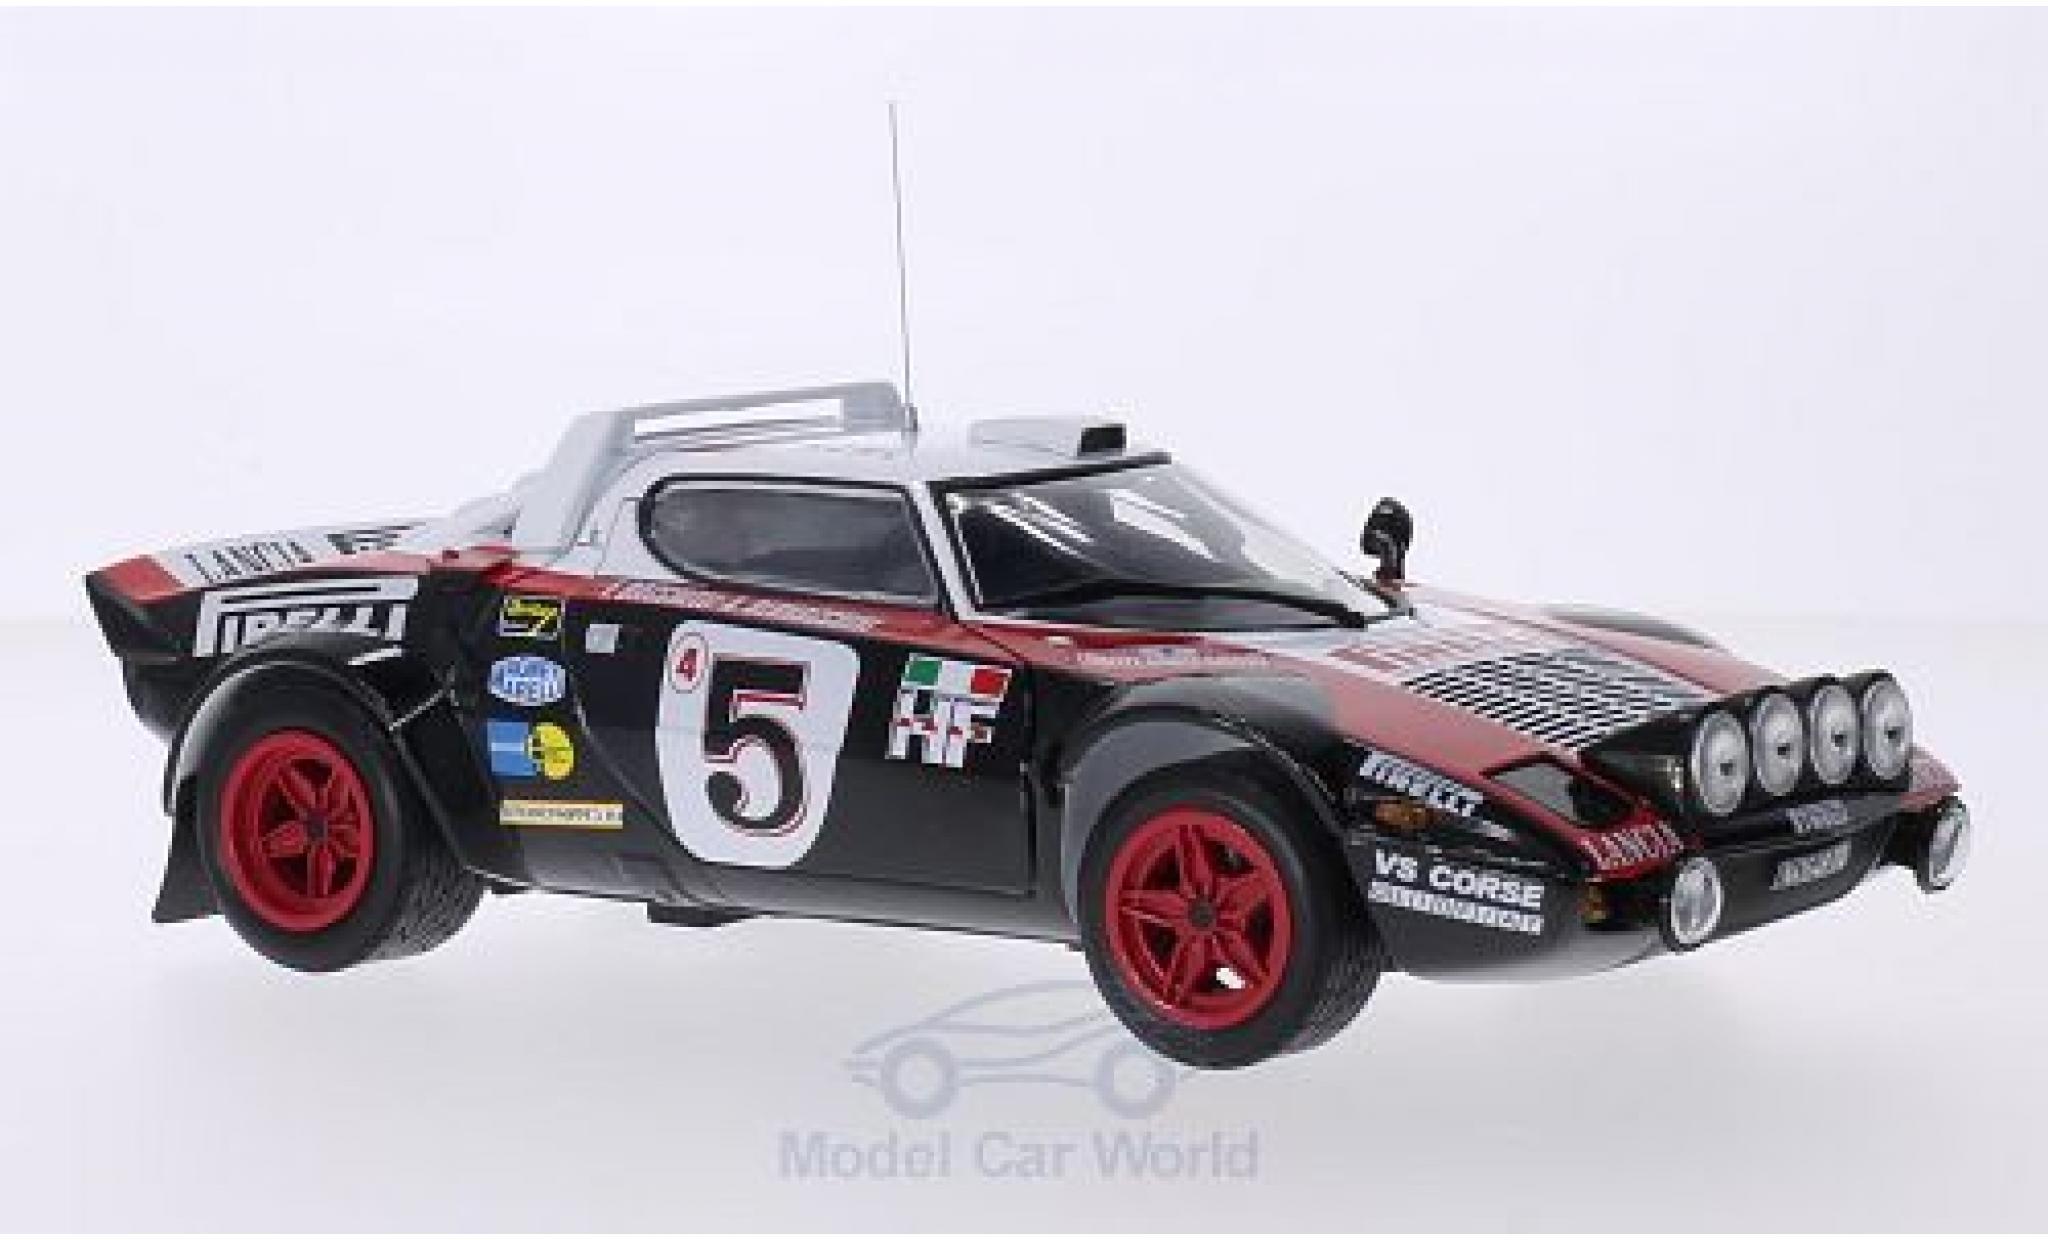 Lancia Stratos 1/18 Sun Star HF Rally No.5 Pirelli Rallye WM Rallye Monte-Carlo 1978 inklusive Abdeckung für Zusatzscheinwerfer F.Bacci/A.Bernacchini